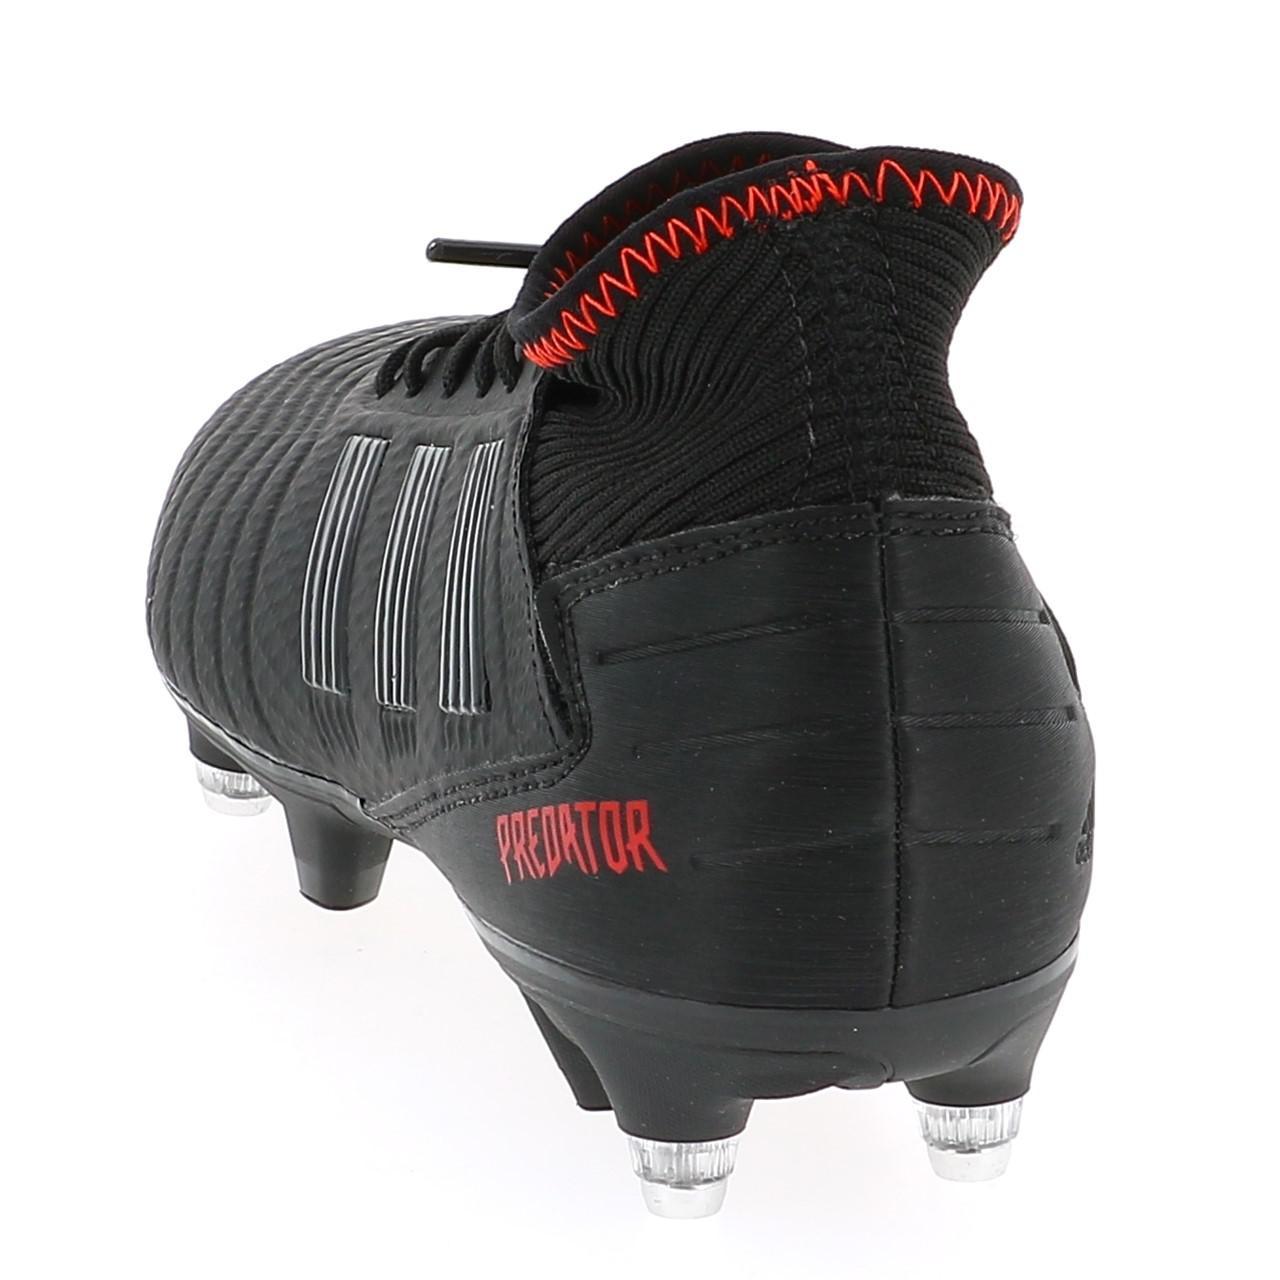 Football-Shoes-Flap-Adidas-Predator-19-3-Black-Sg-Black-41815-New thumbnail 2